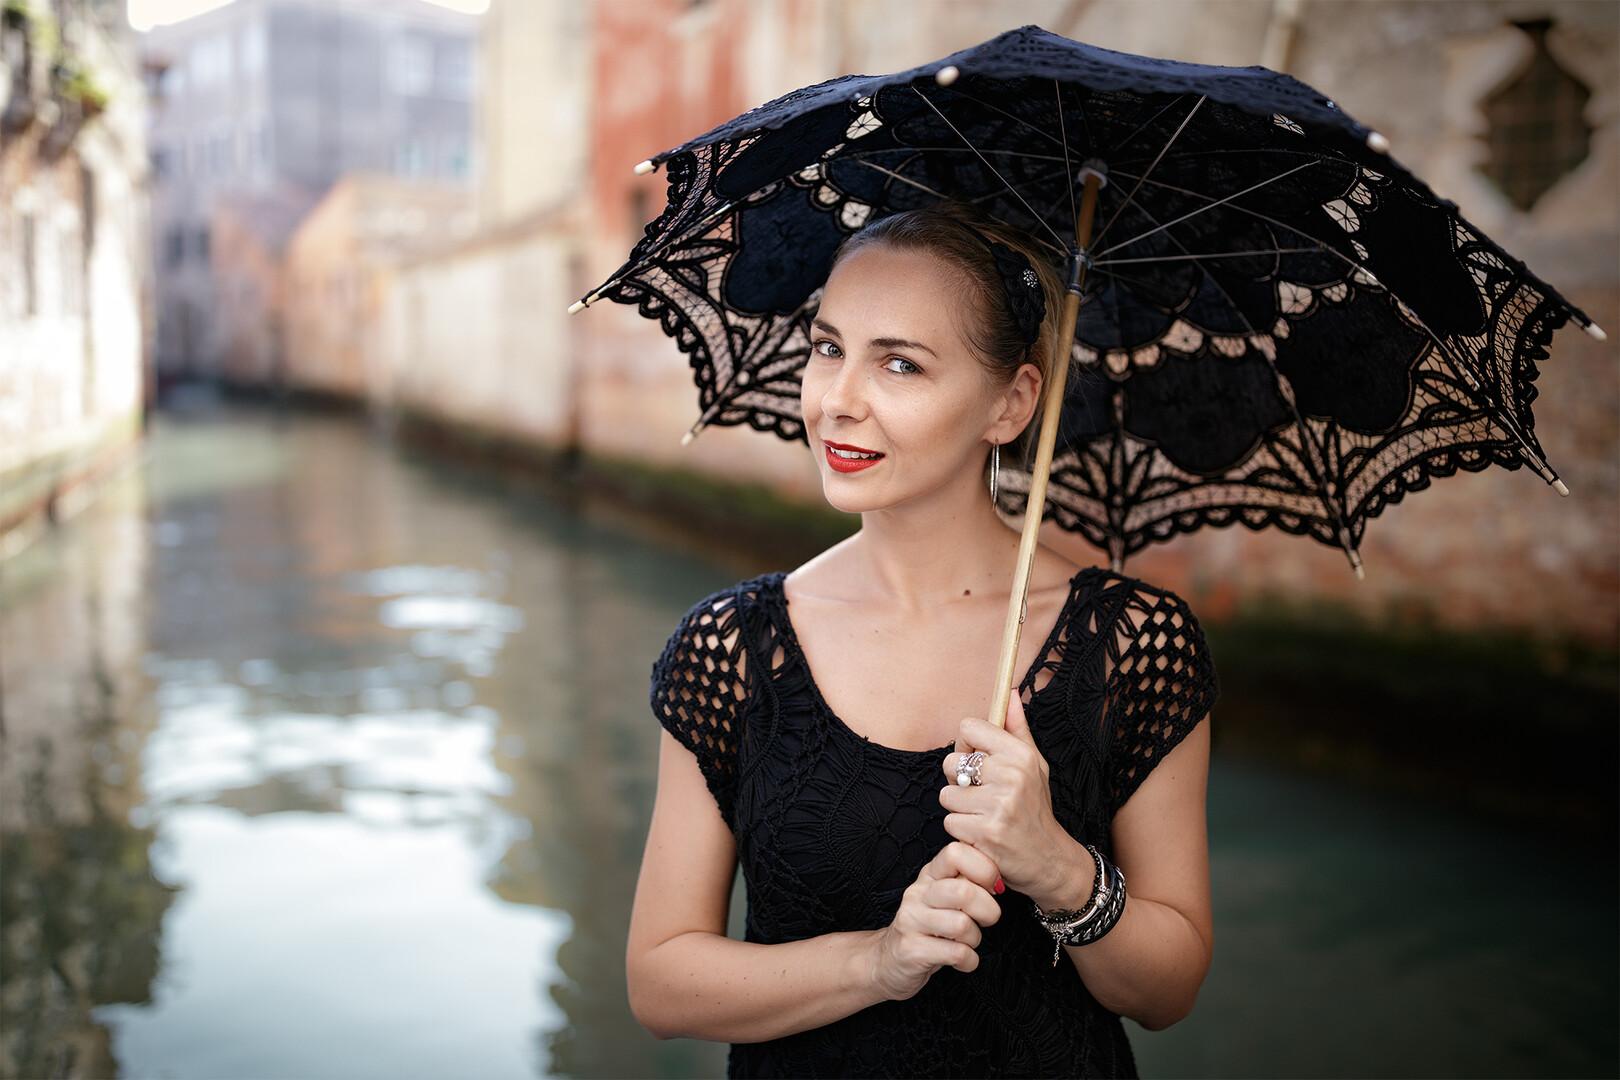 Lady in Venice...